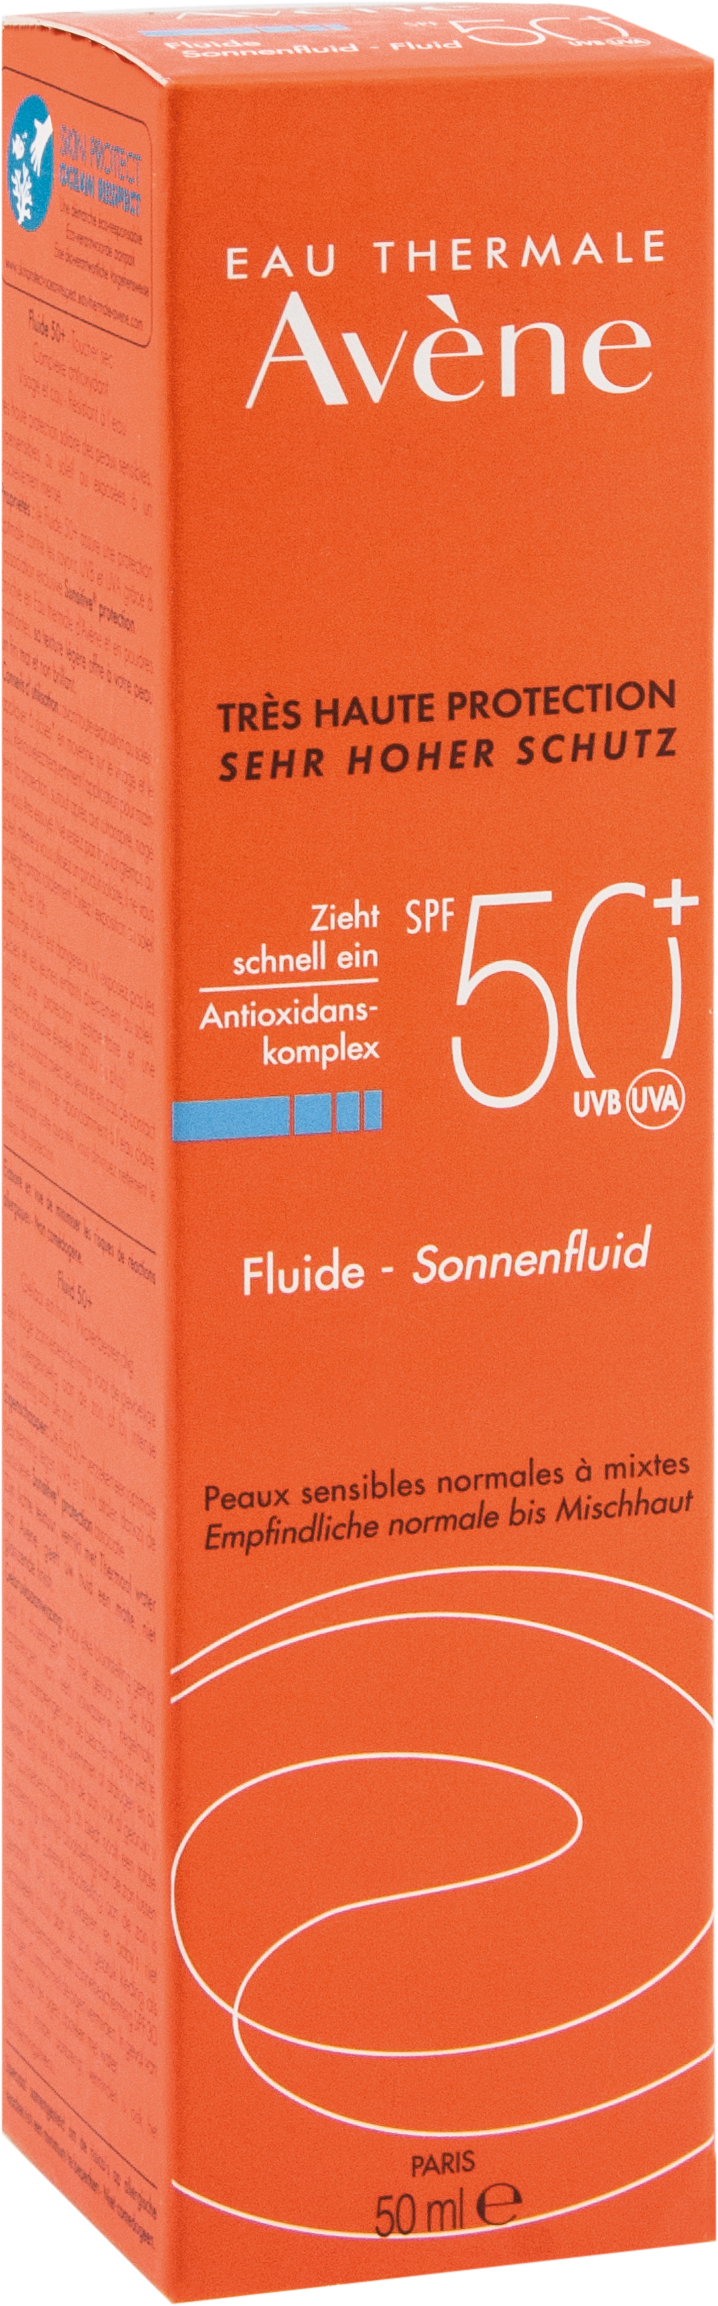 AVENE SunSitive Sonnenfluid SPF 50+